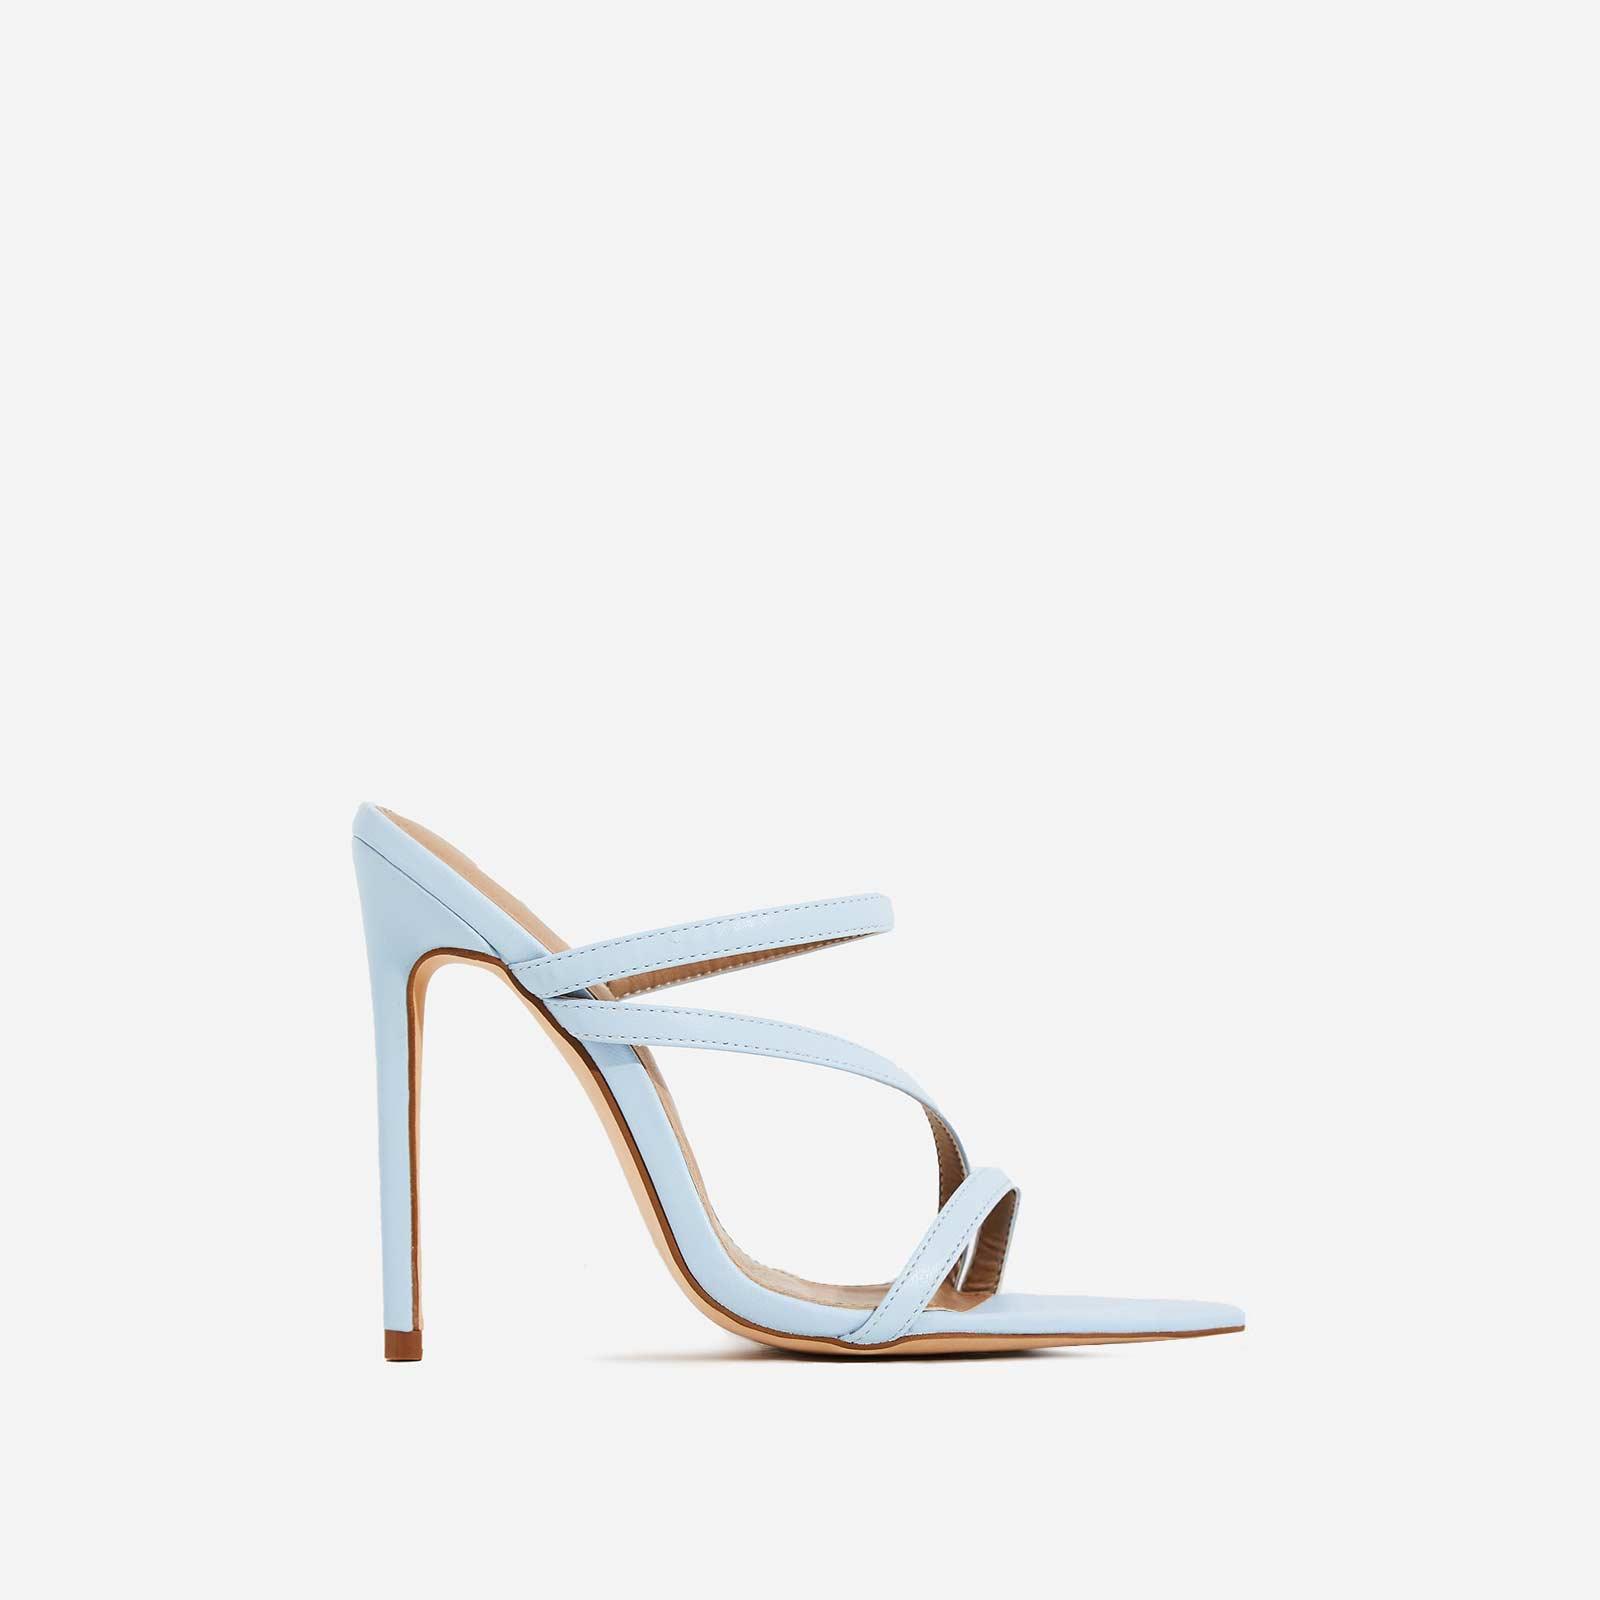 Aria Toe Strap Heel Mule In Light Blue Faux Leather